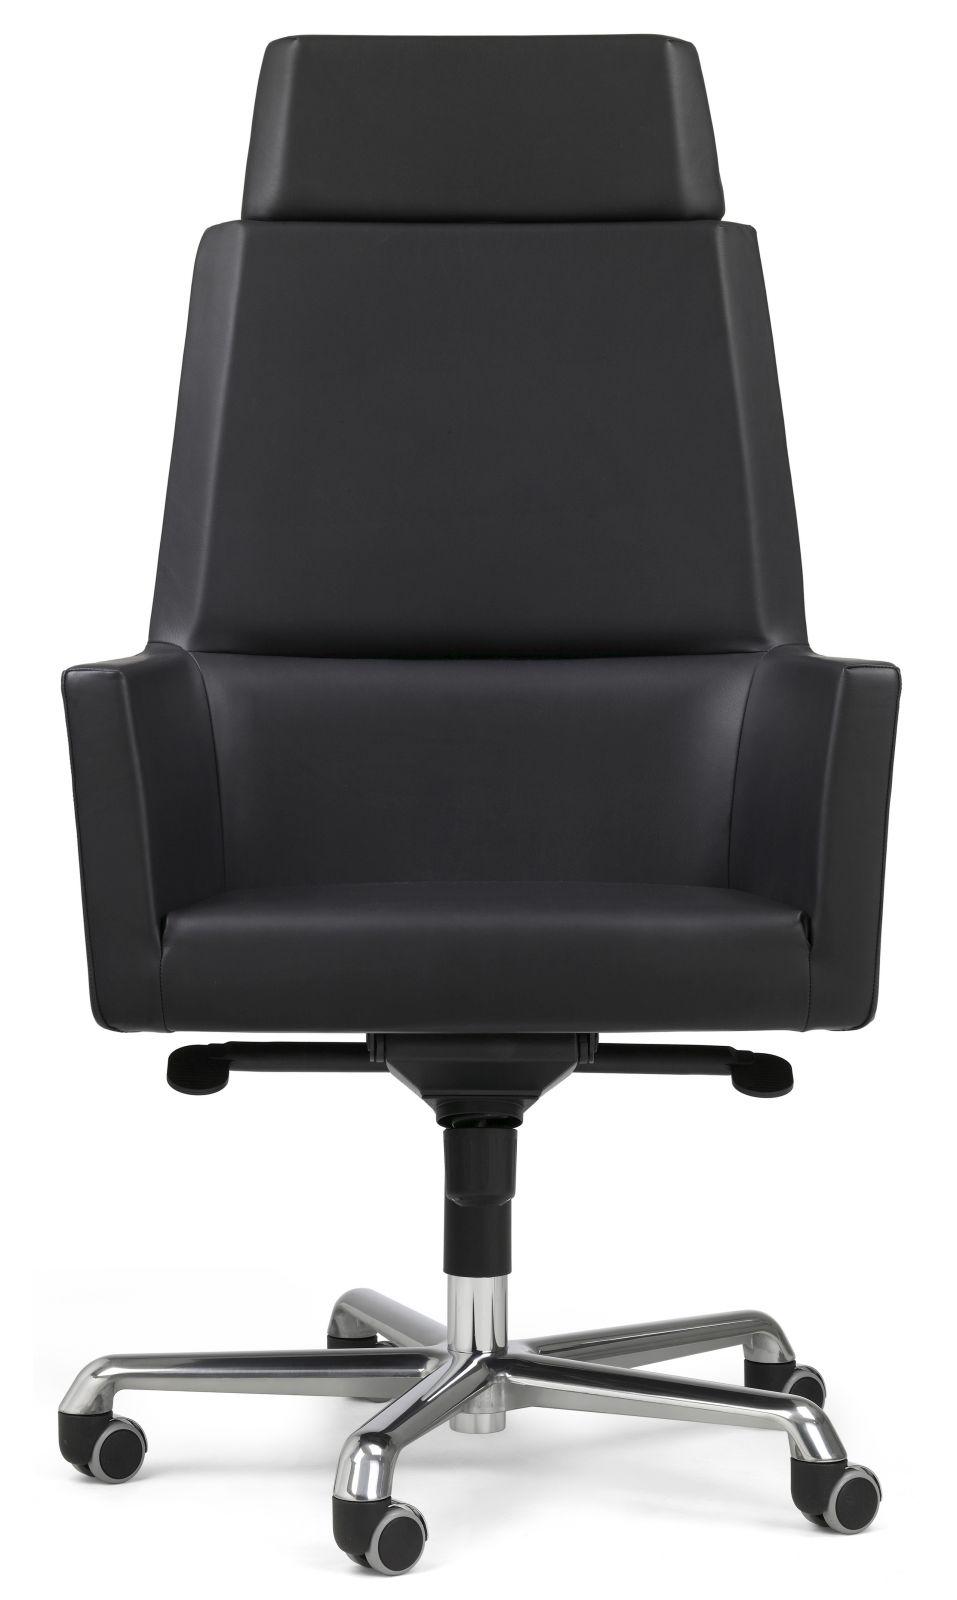 modern-office-chairs-Italian-furniture-designer-chairs (2).jpg